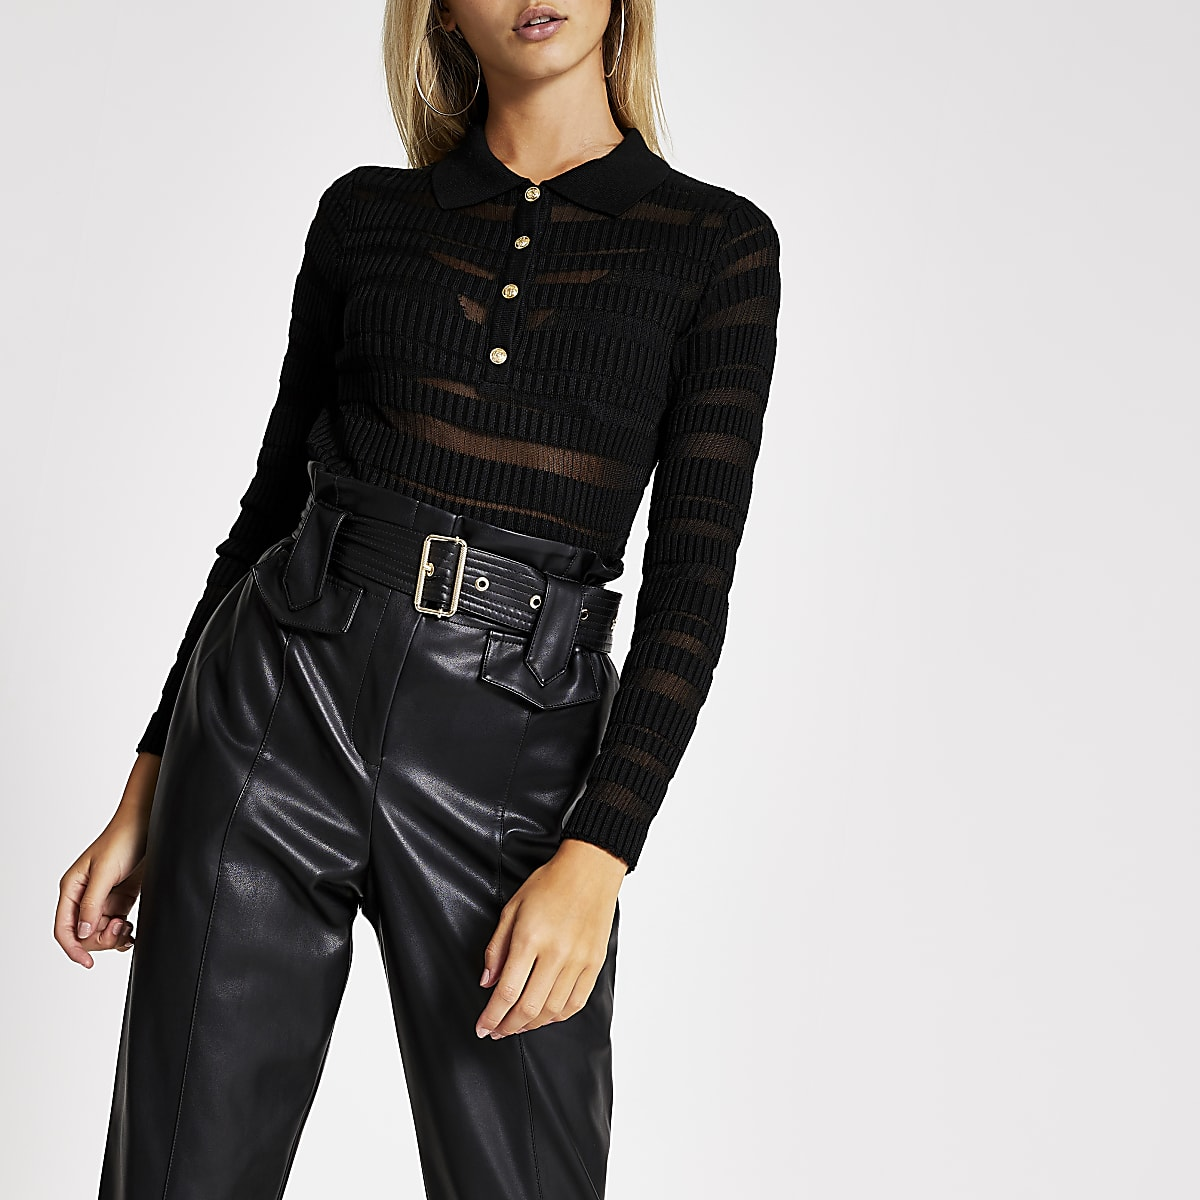 Black sheered long sleeve polo top